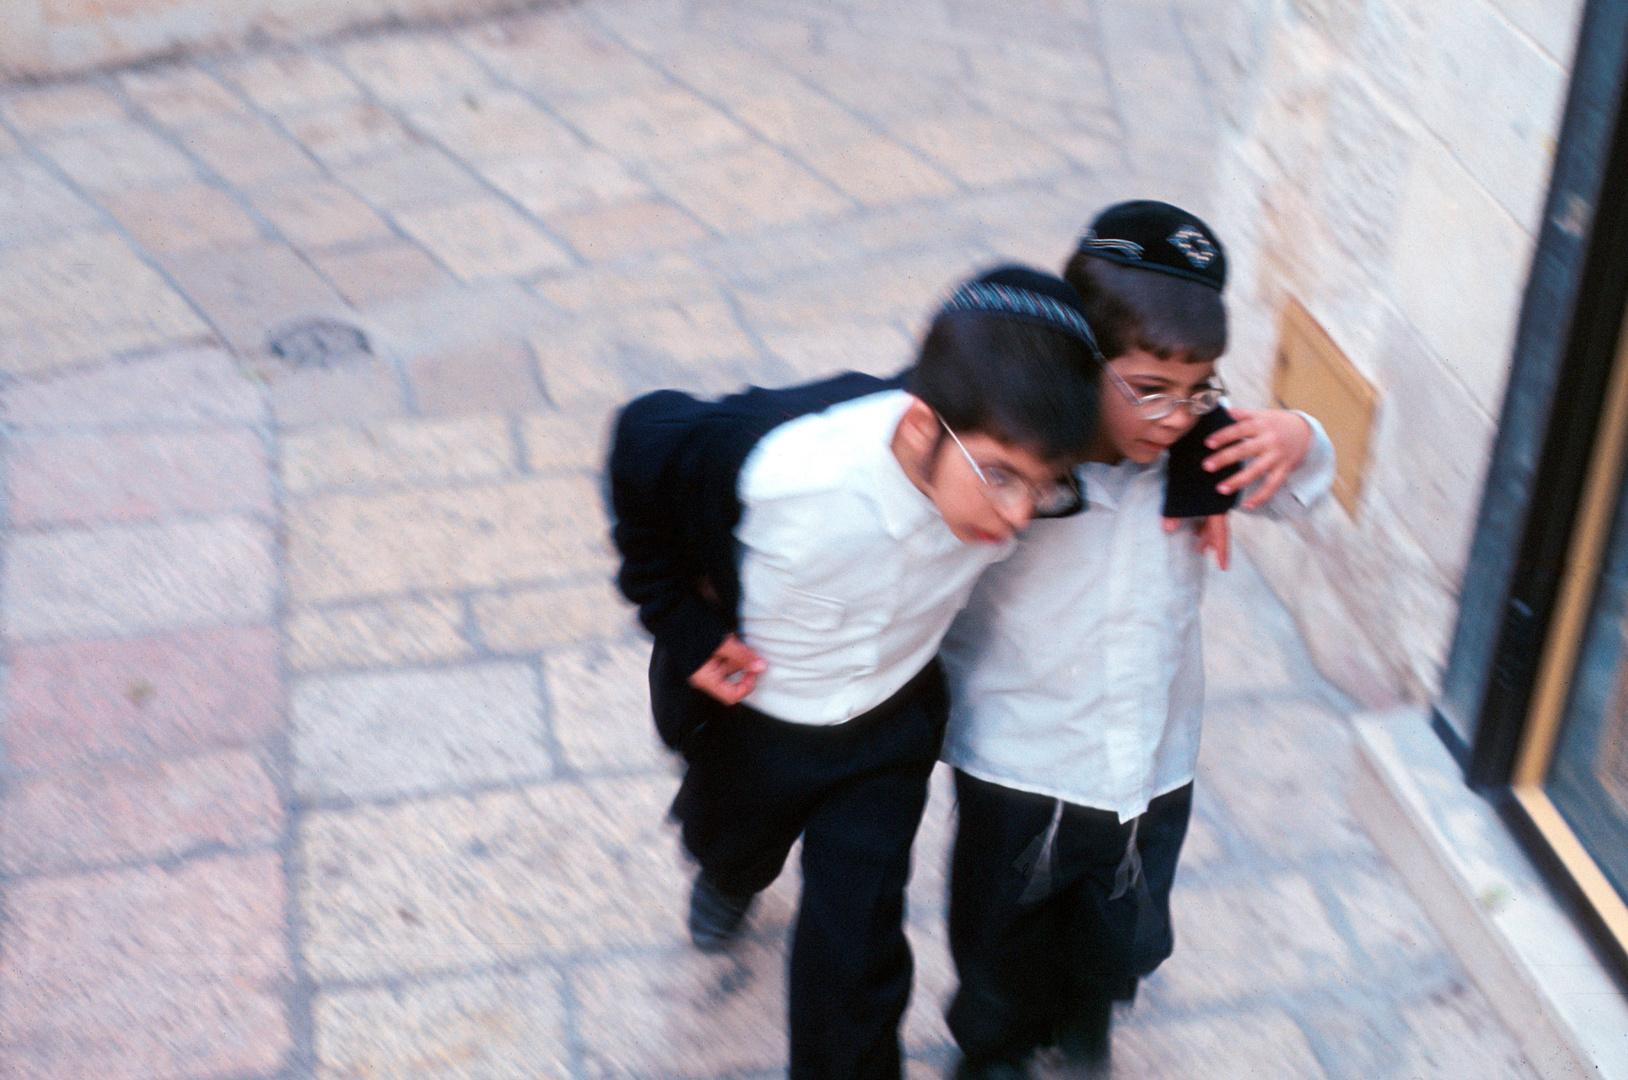 Friends on Sabbath Day, Jerusalem, Israel, 2000